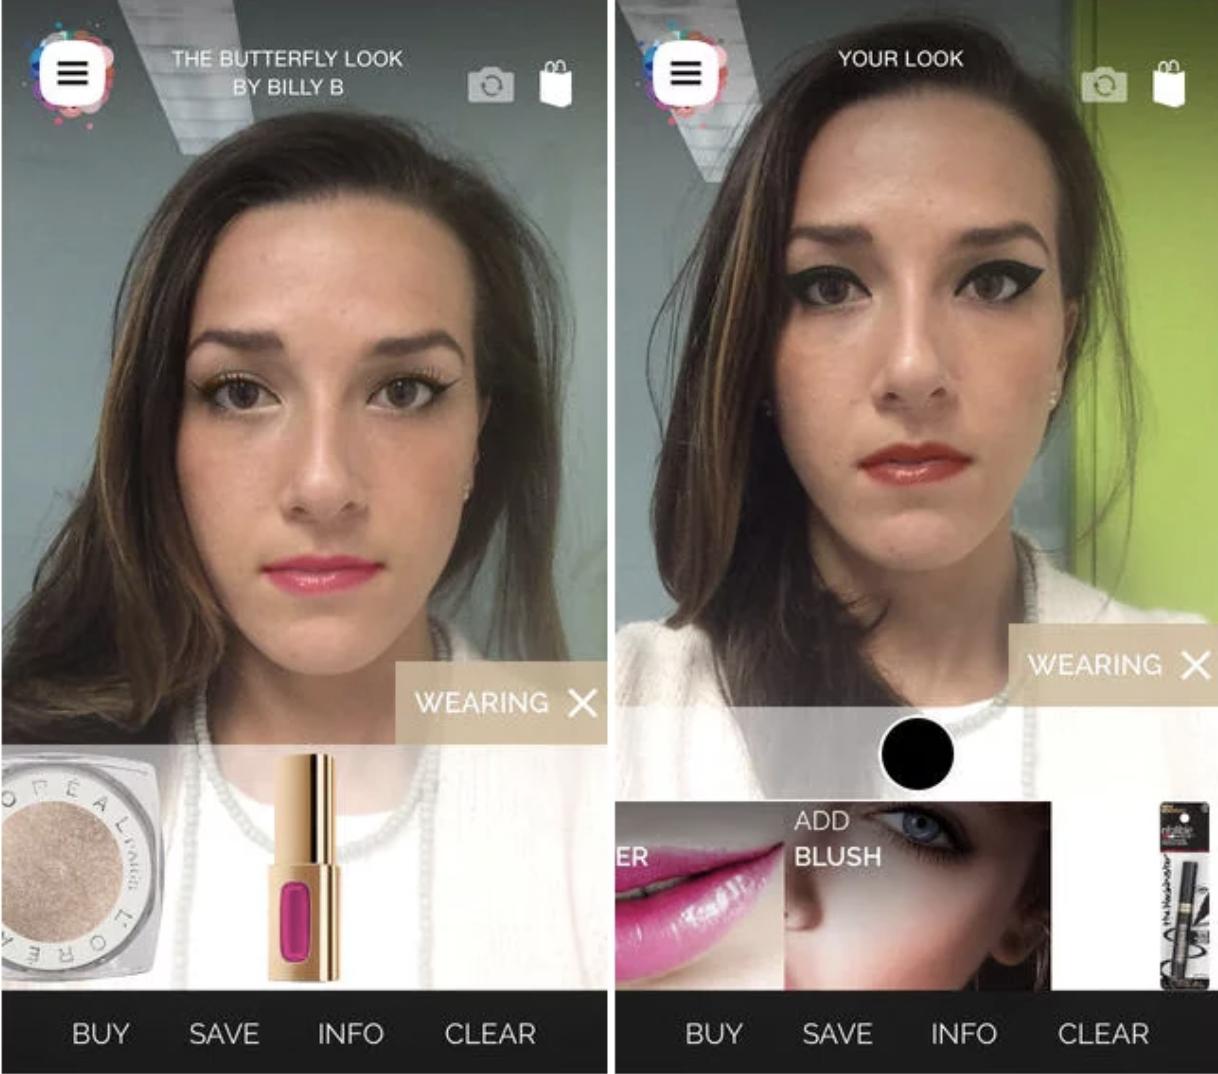 a screenshot of L'Oreal's makeup genius app